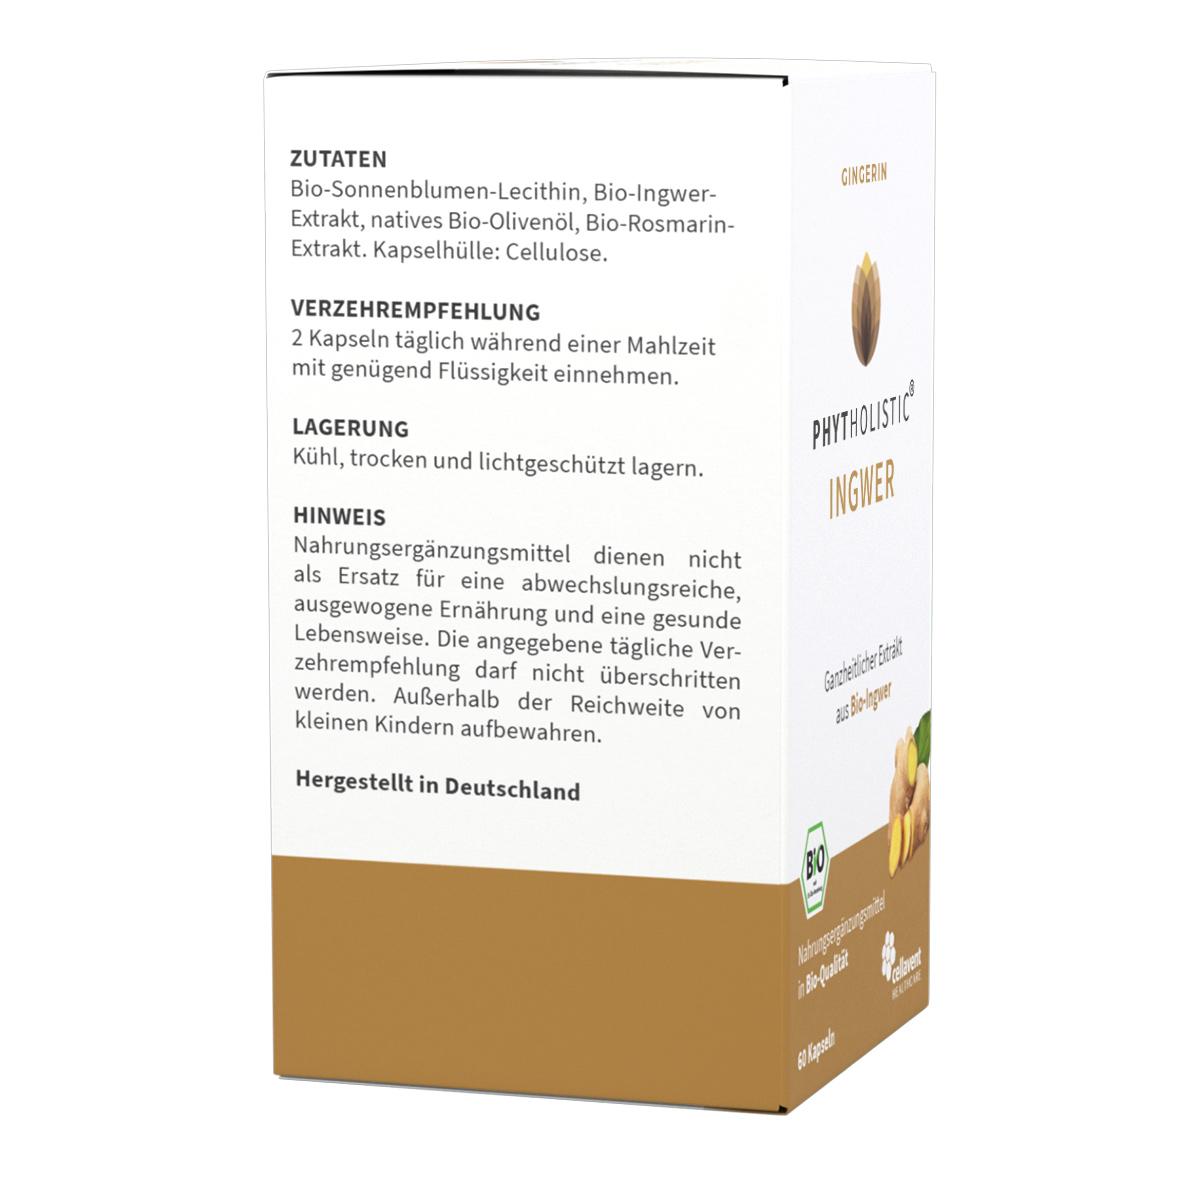 ingwer-kapseln-bio-rein-pflanzlich-gingerin-phytholistic-60-stueckverpackung-links-1200x1200